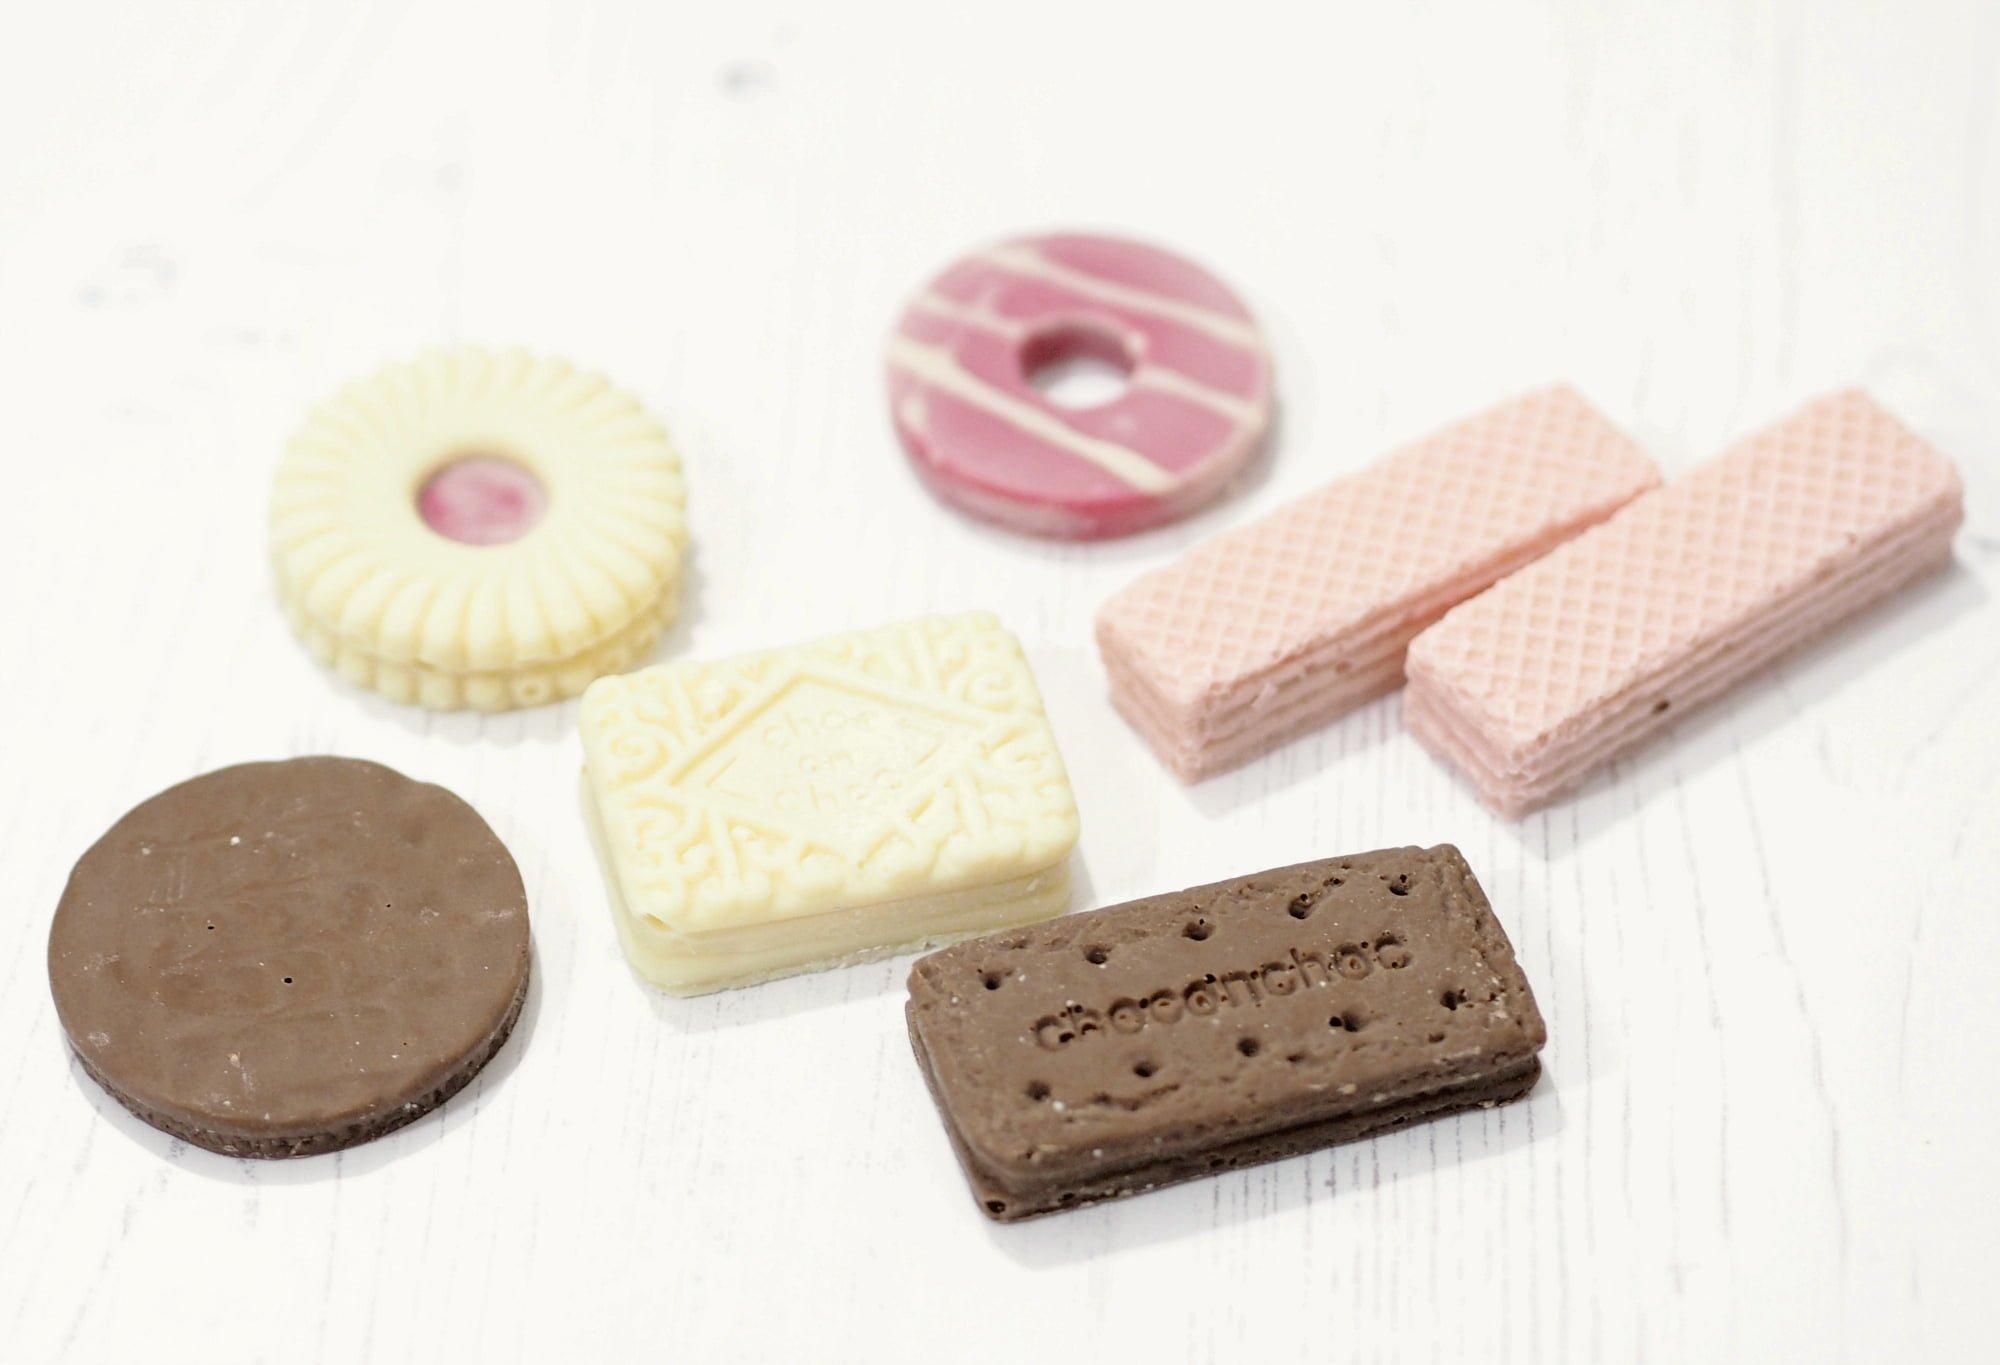 Choc on Choc Biscuit Chocolates